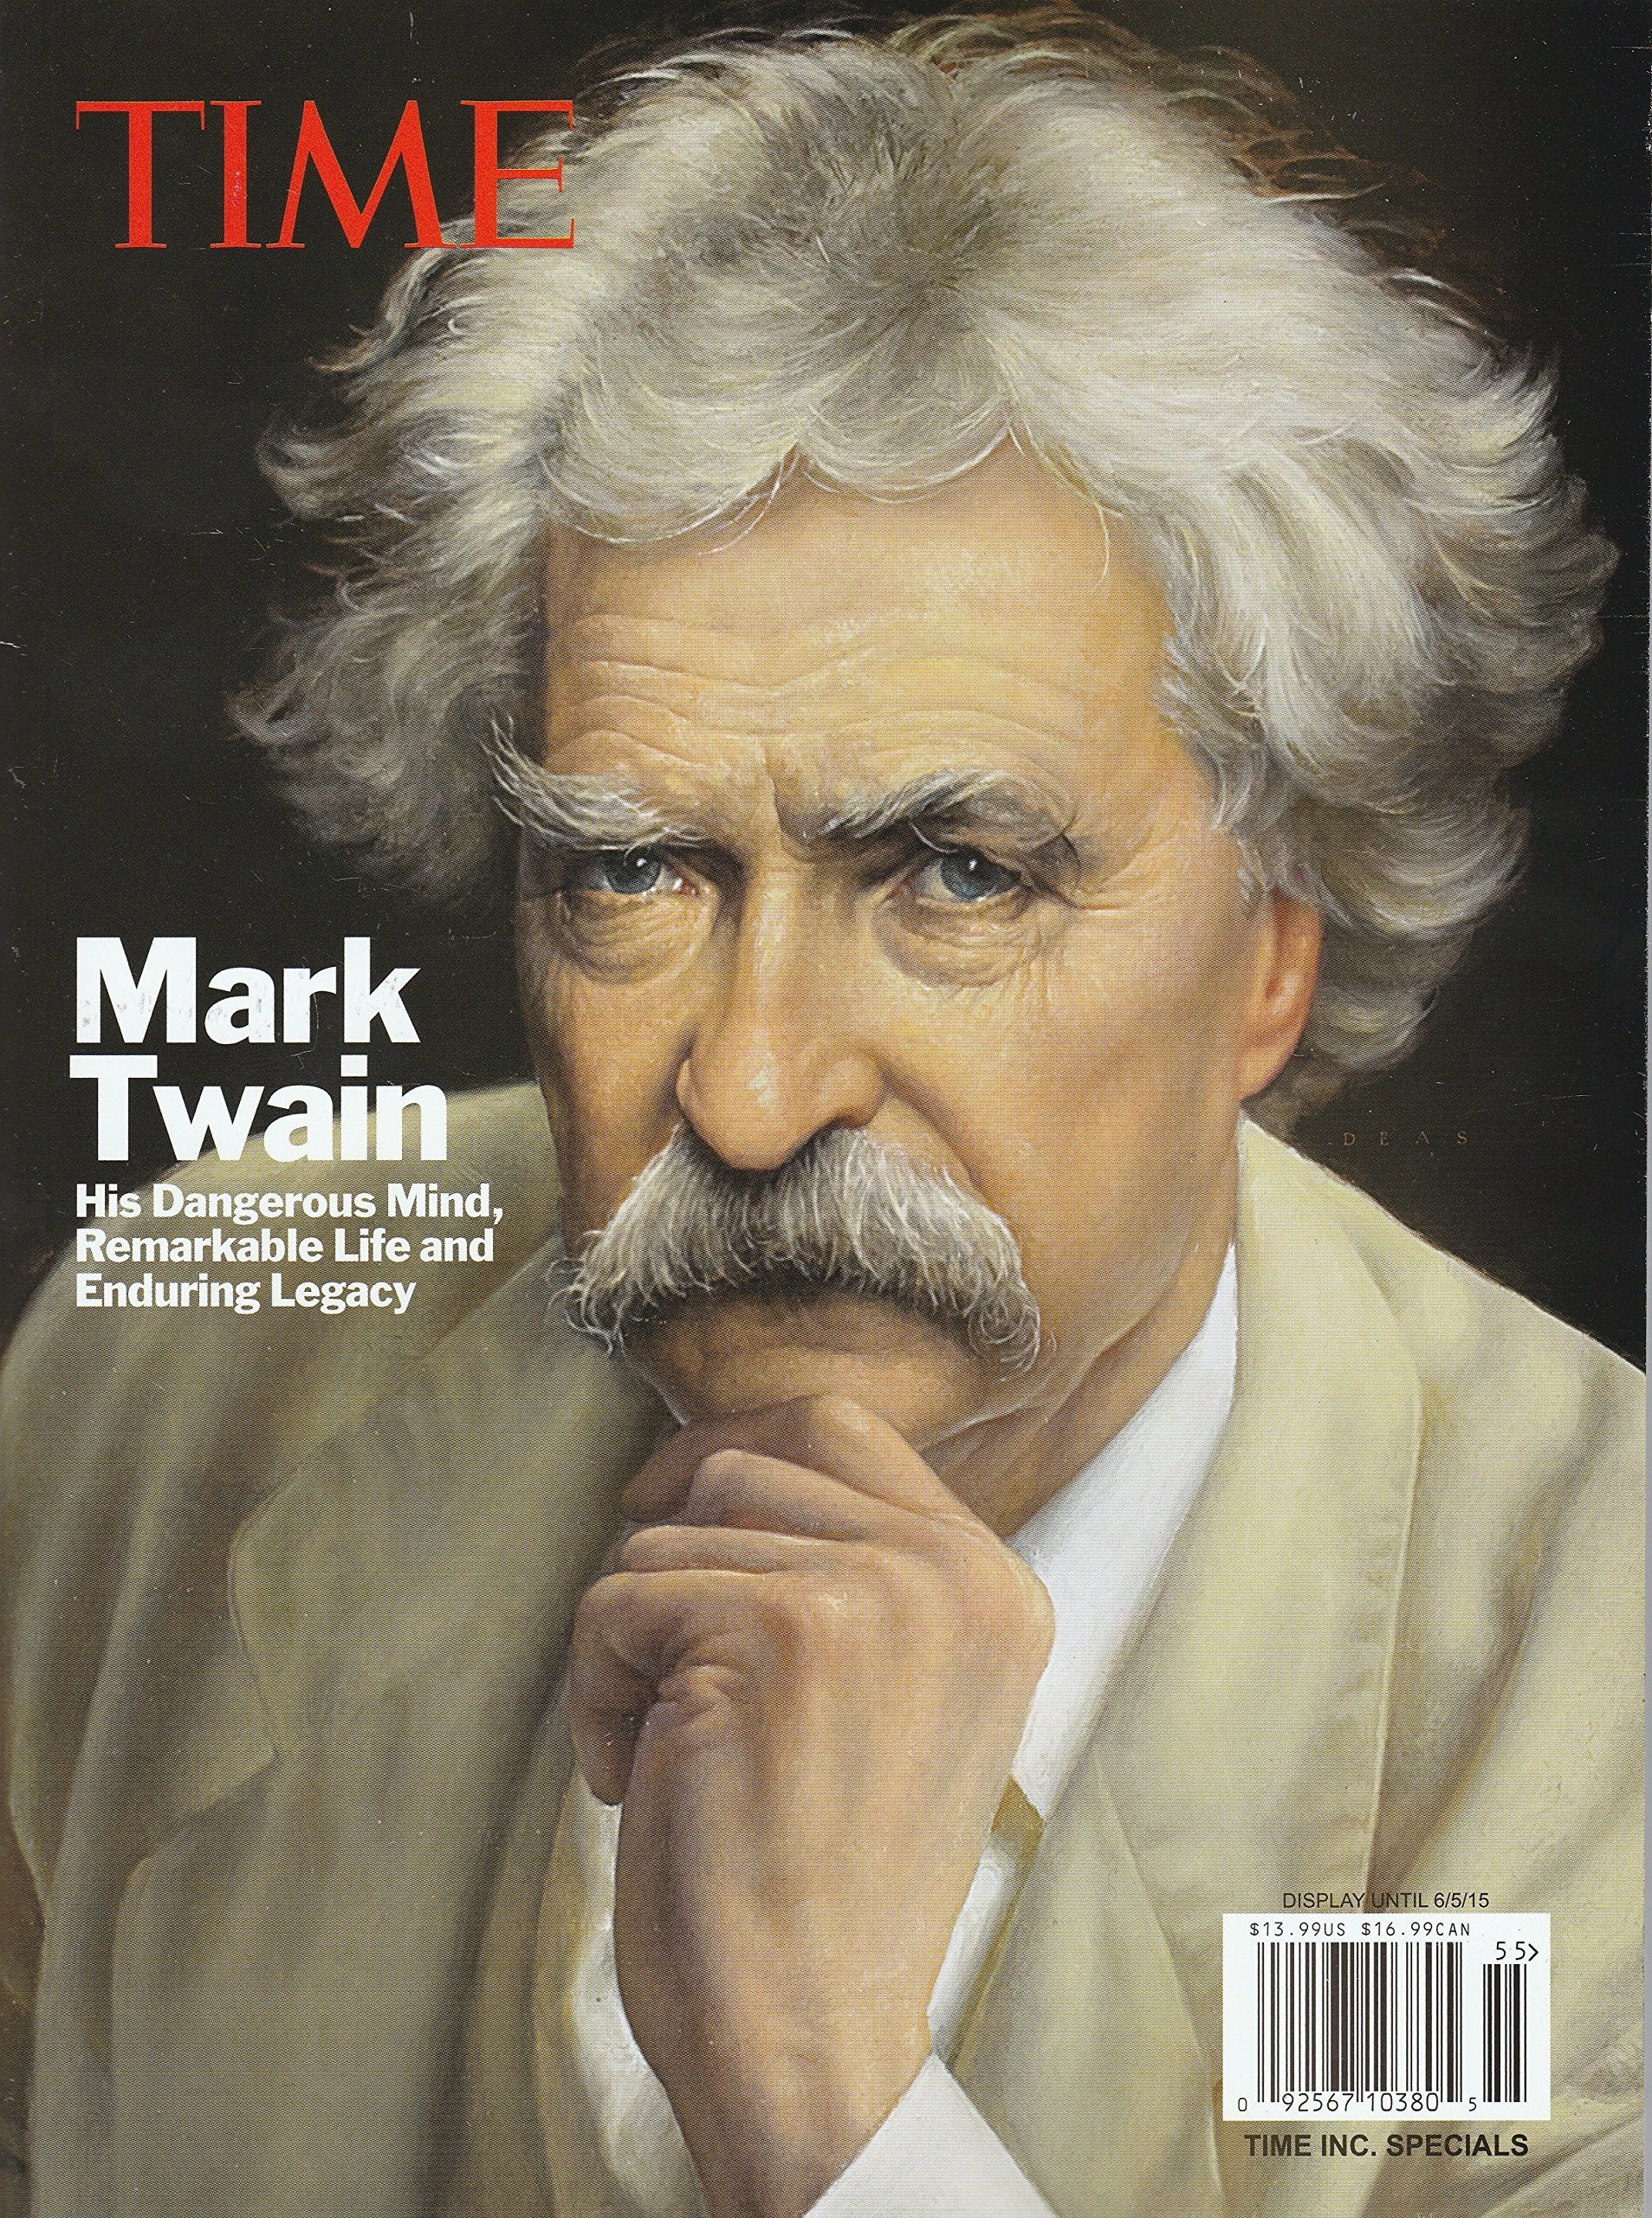 MarkTwainTime33333